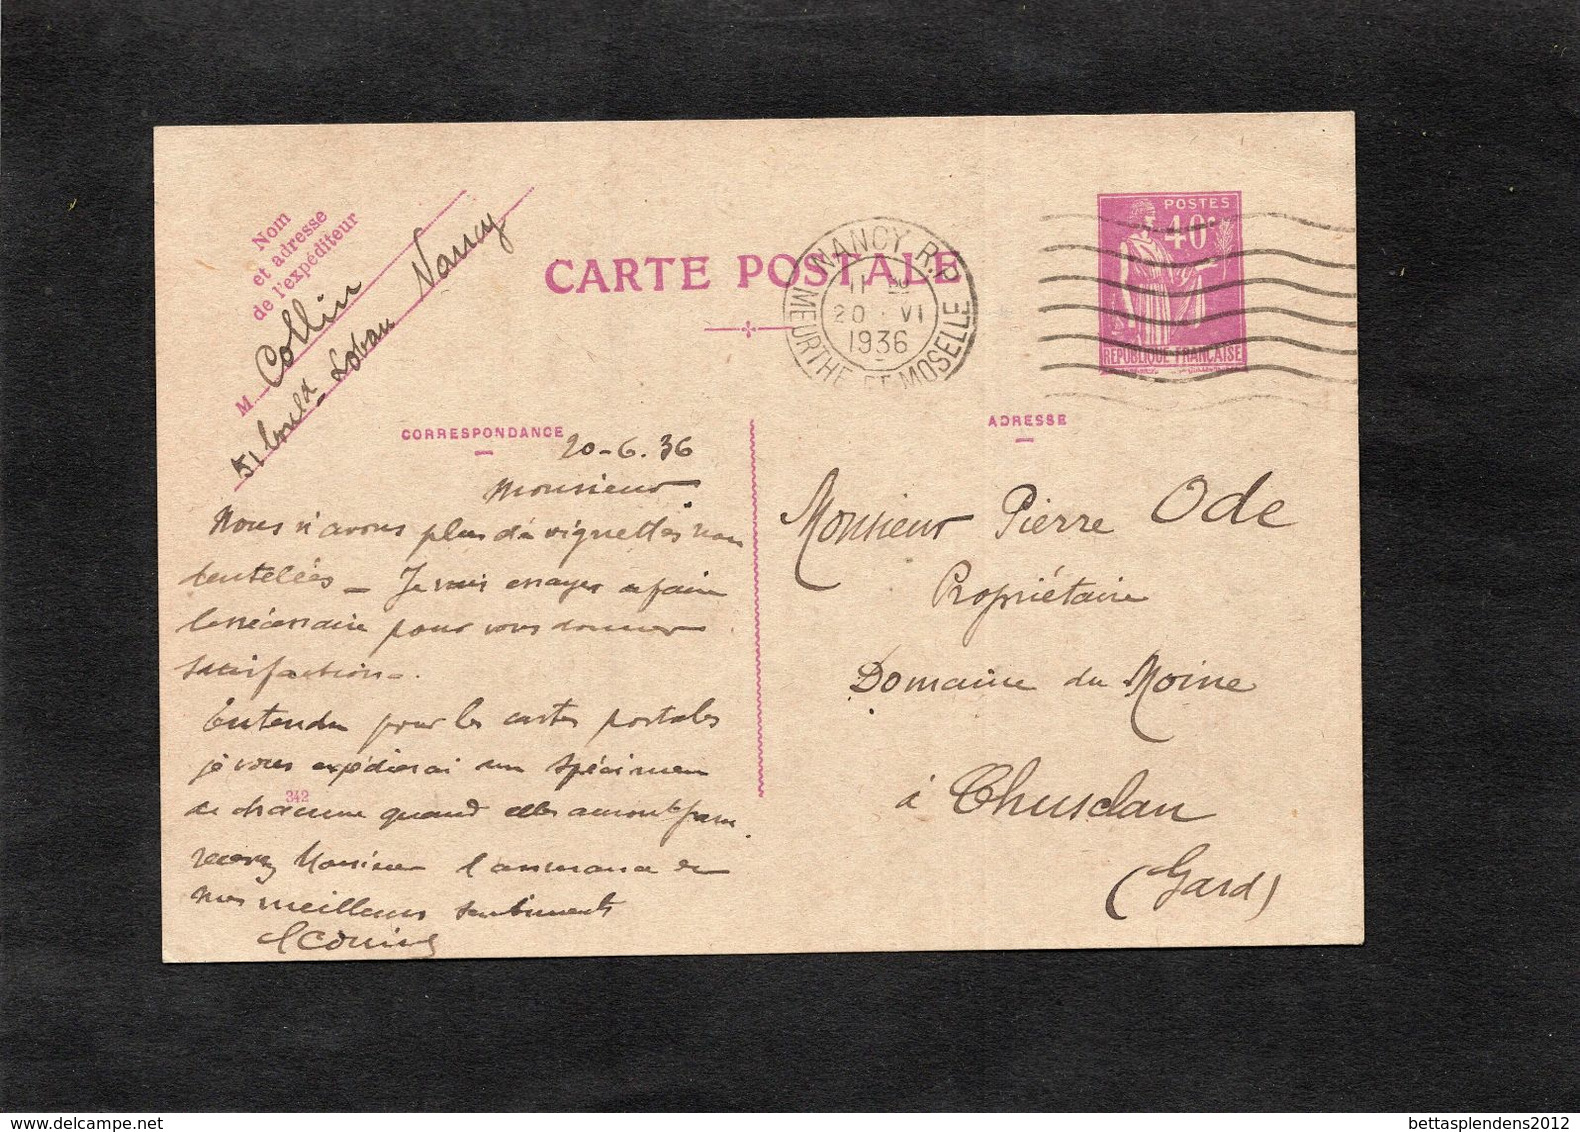 VITTEL 12-15 Aout 1934 - EXPOSITION PHILATELIQUE - Entier Postal Ayant Circulé - Cachet Hexagonal CHUSCLAN (Gard) - Ganzsachen